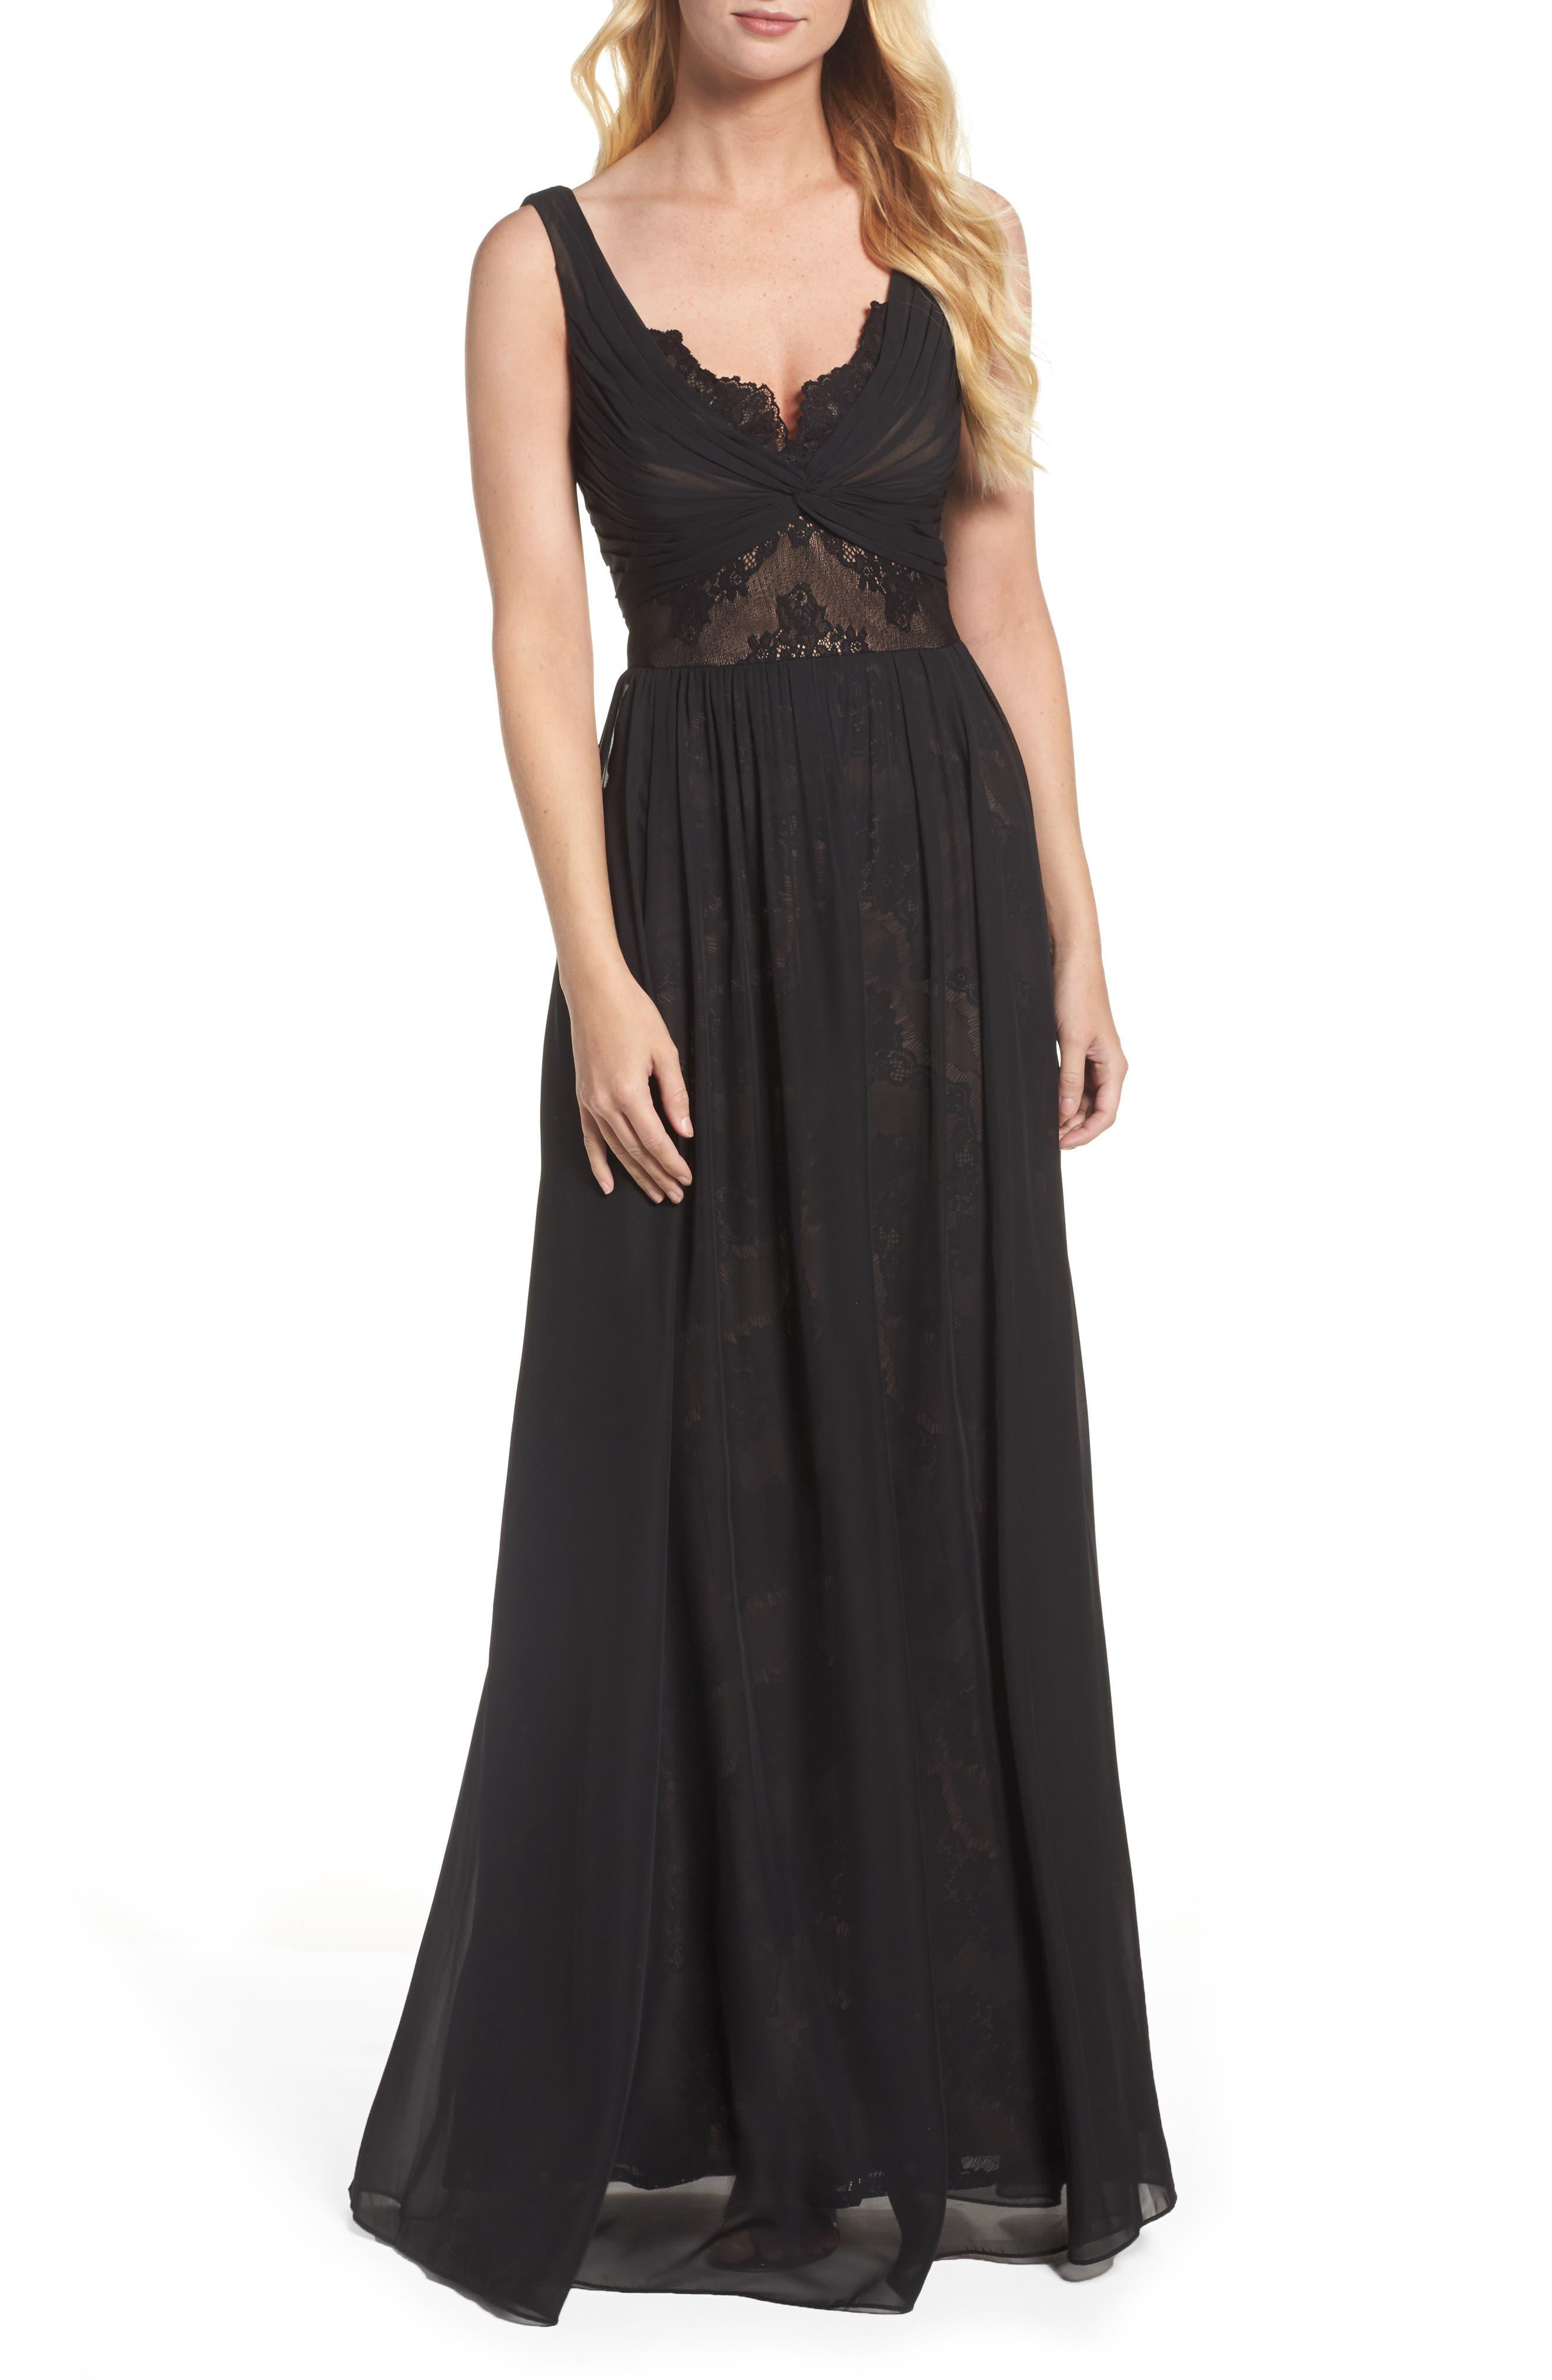 Lace Detail Gown,                         Main,                         color, Black Nude